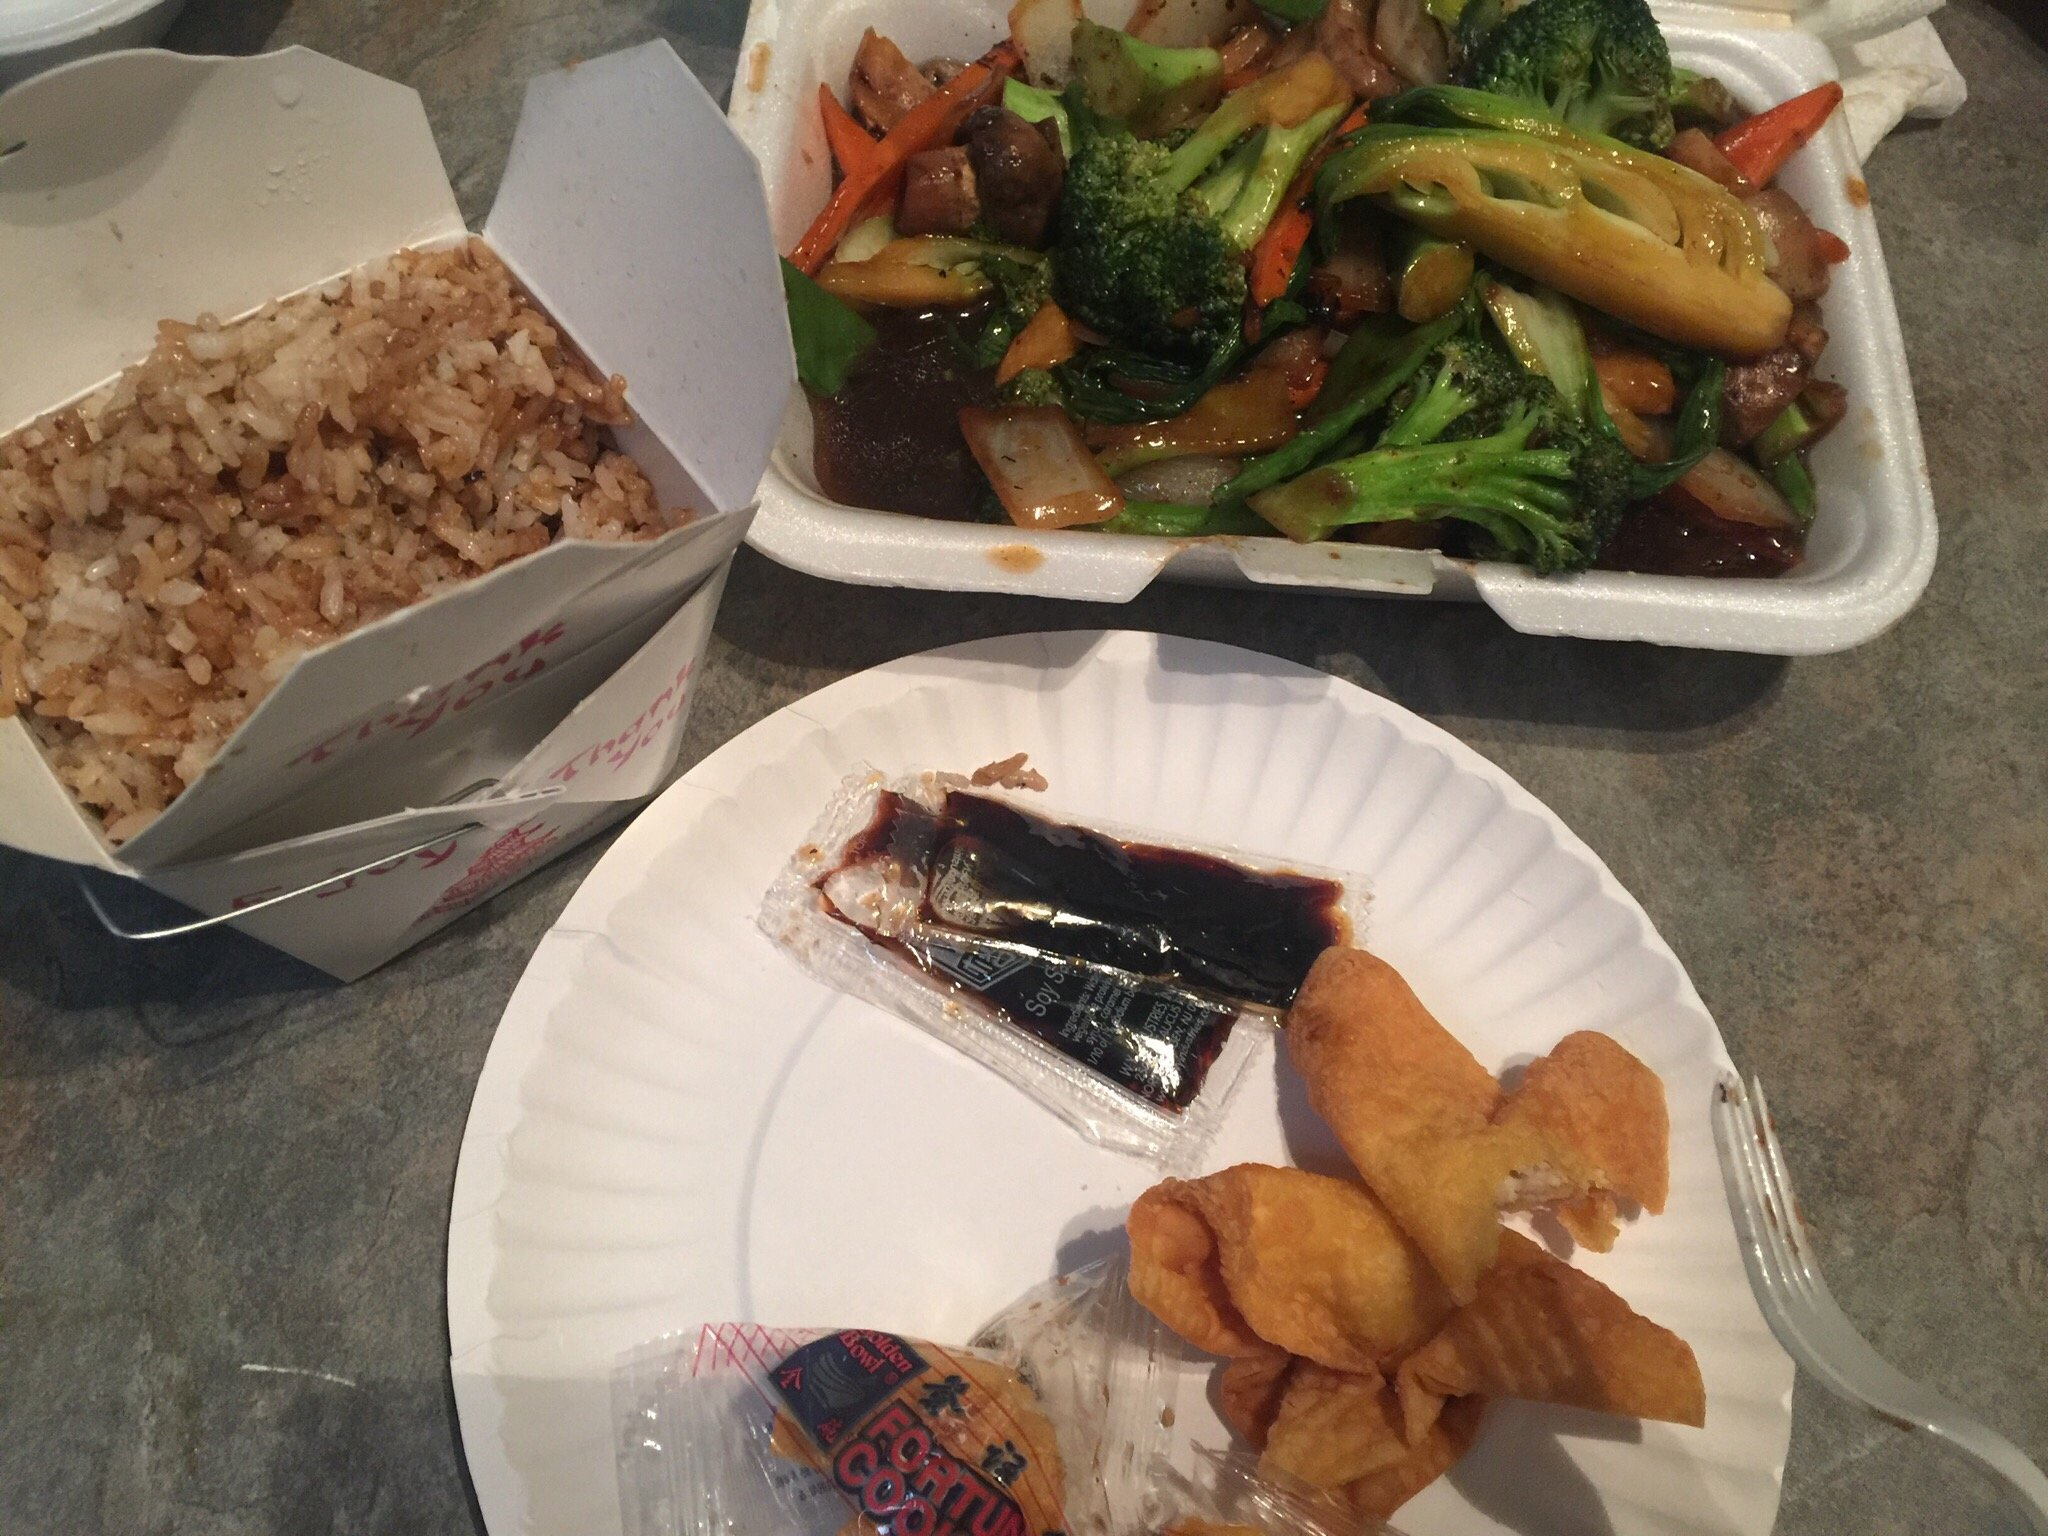 Wong Lee's Chinese Cuisine 1110 Pinellas Bayway S, St. Petersburg